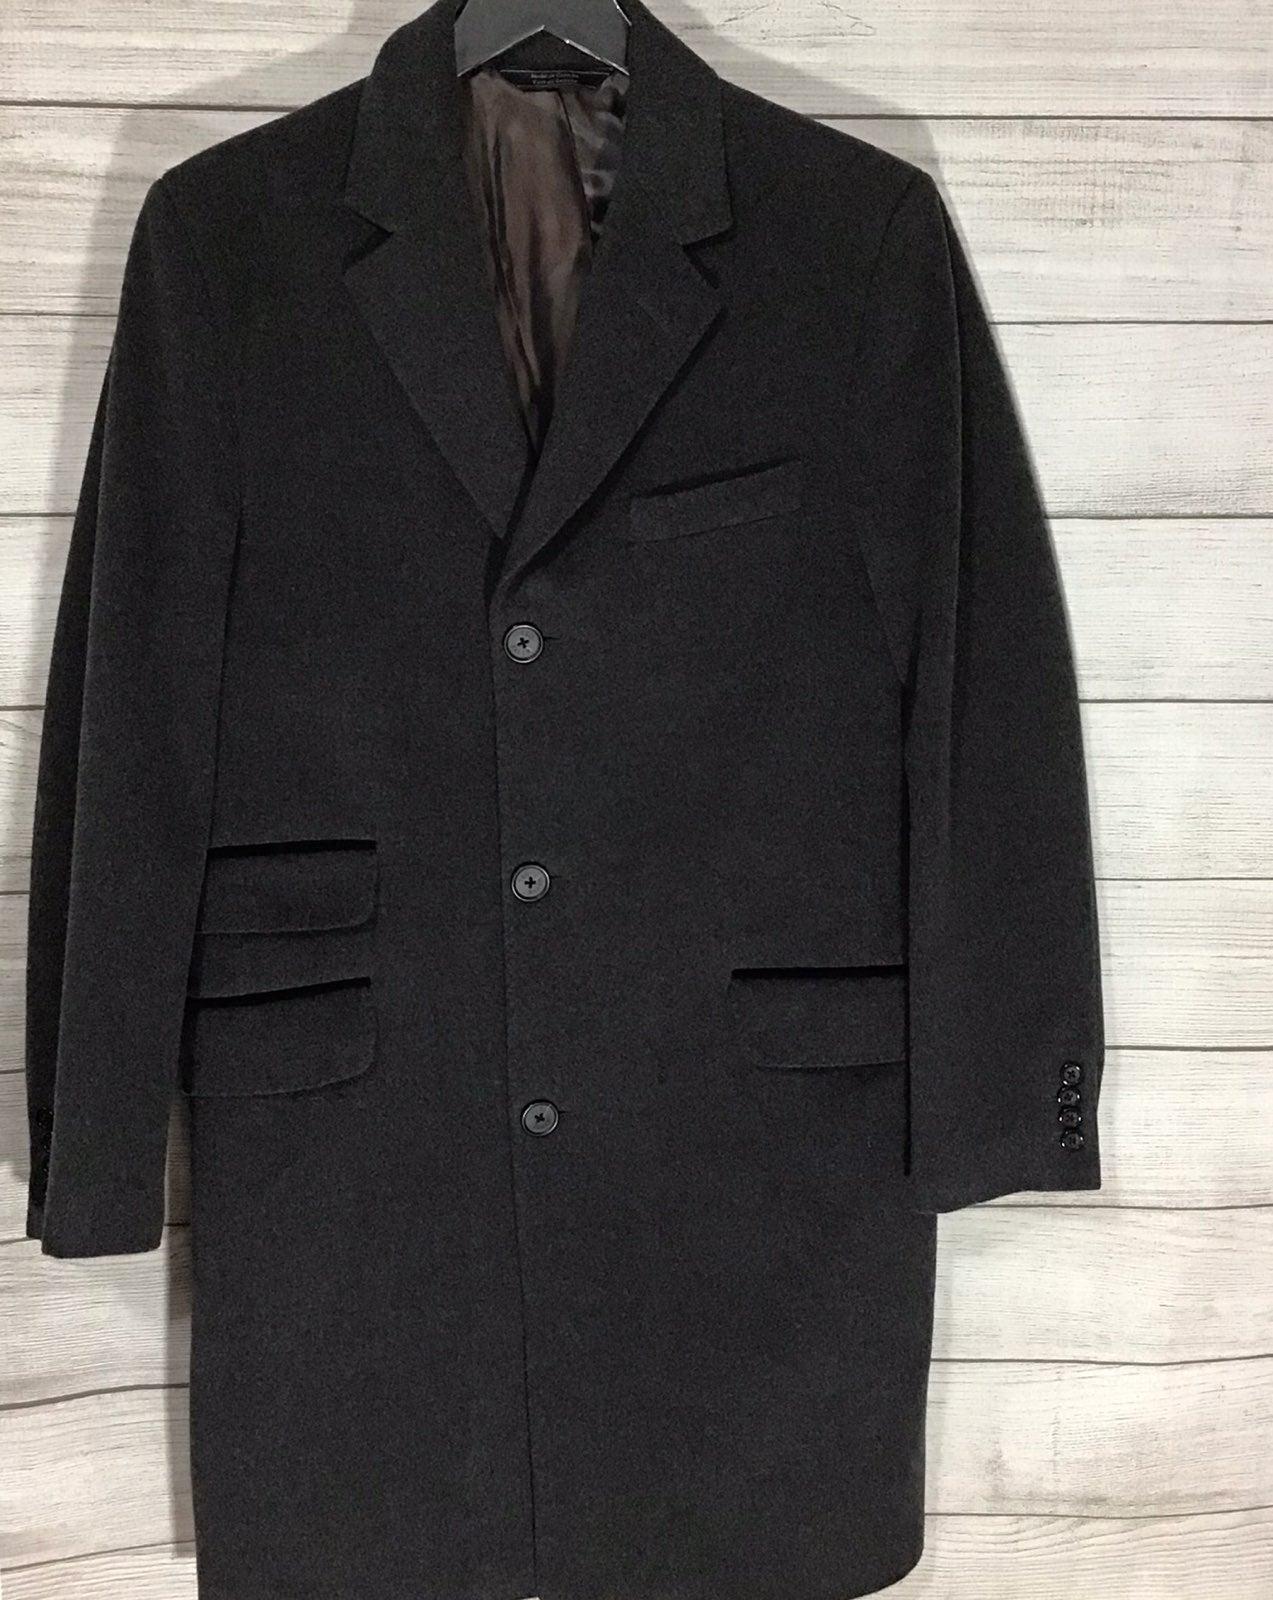 Ted Baker London Wool Overcoat Size 36